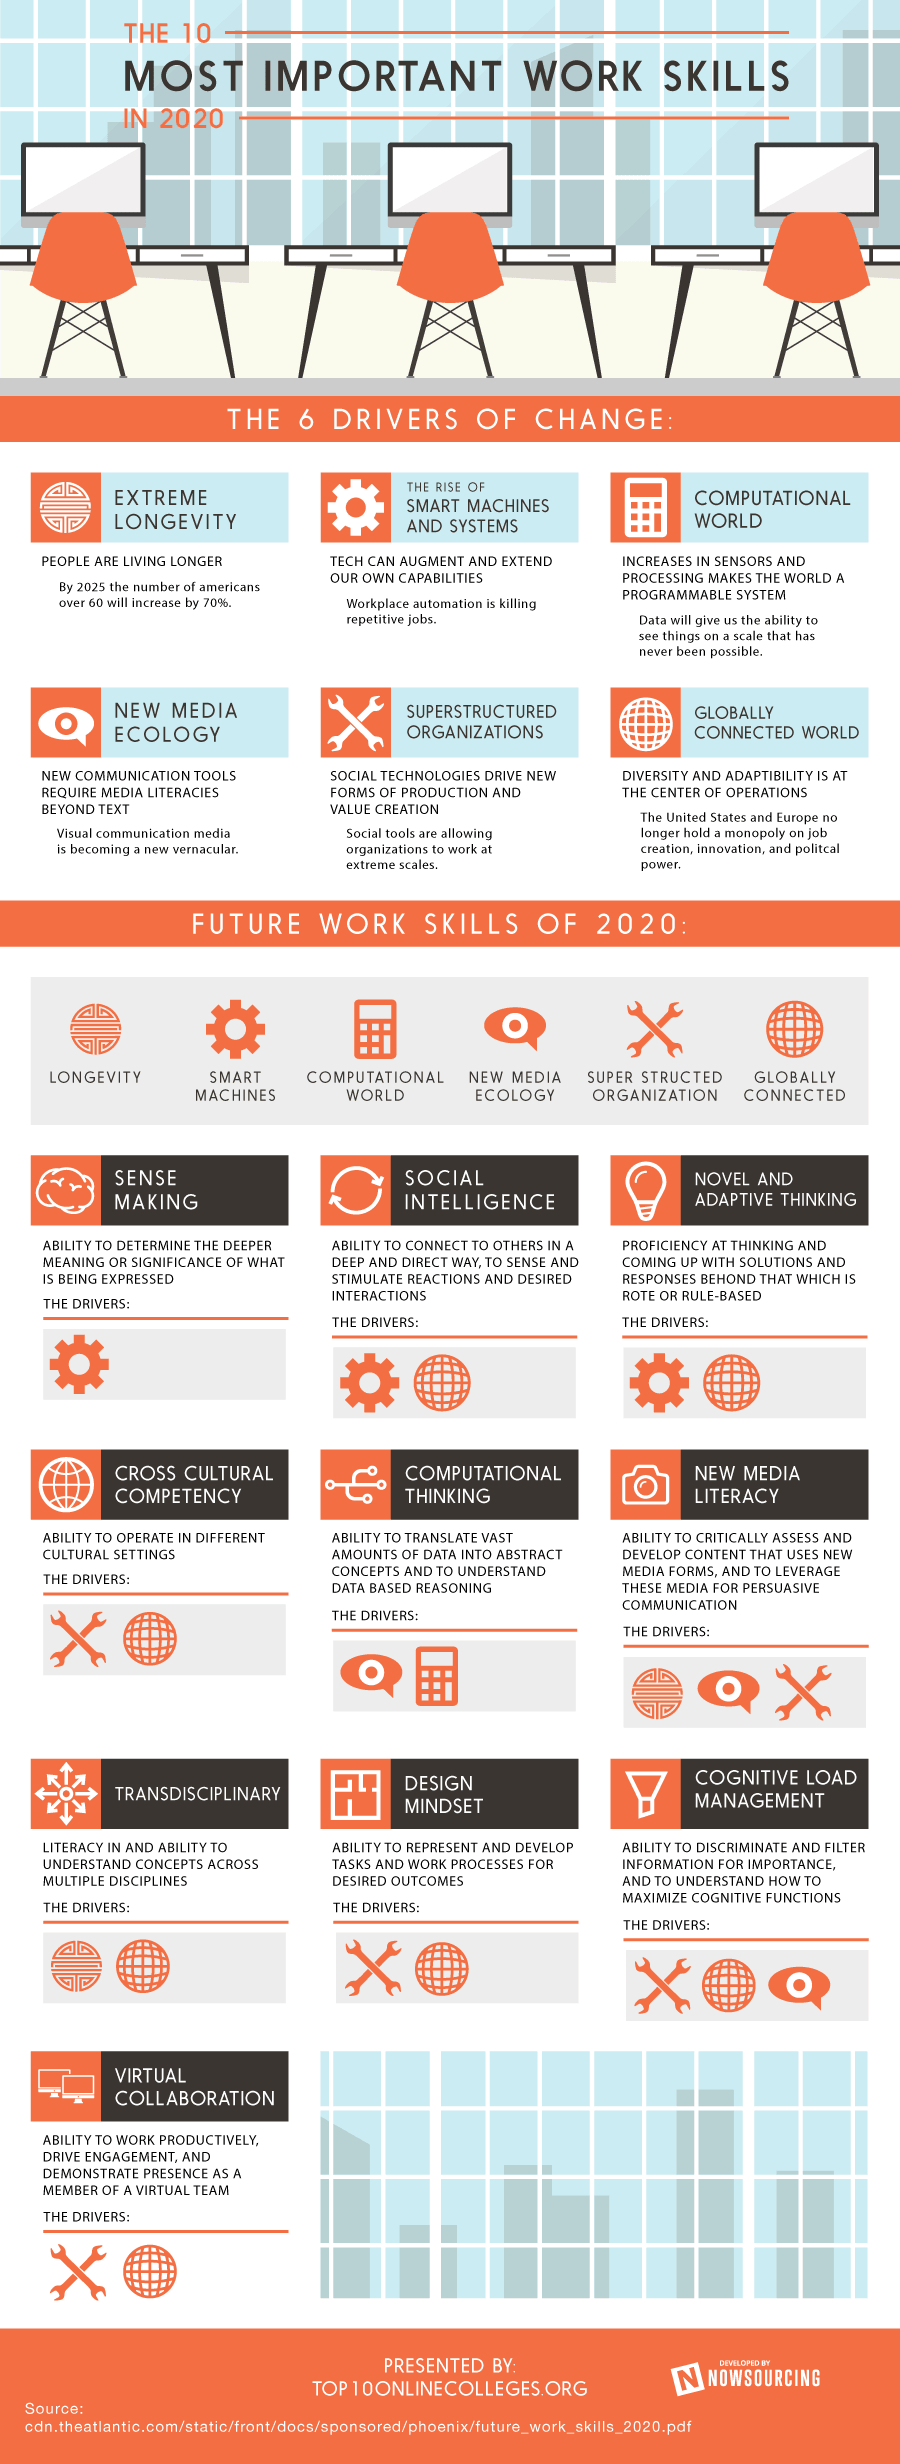 2020 jobs